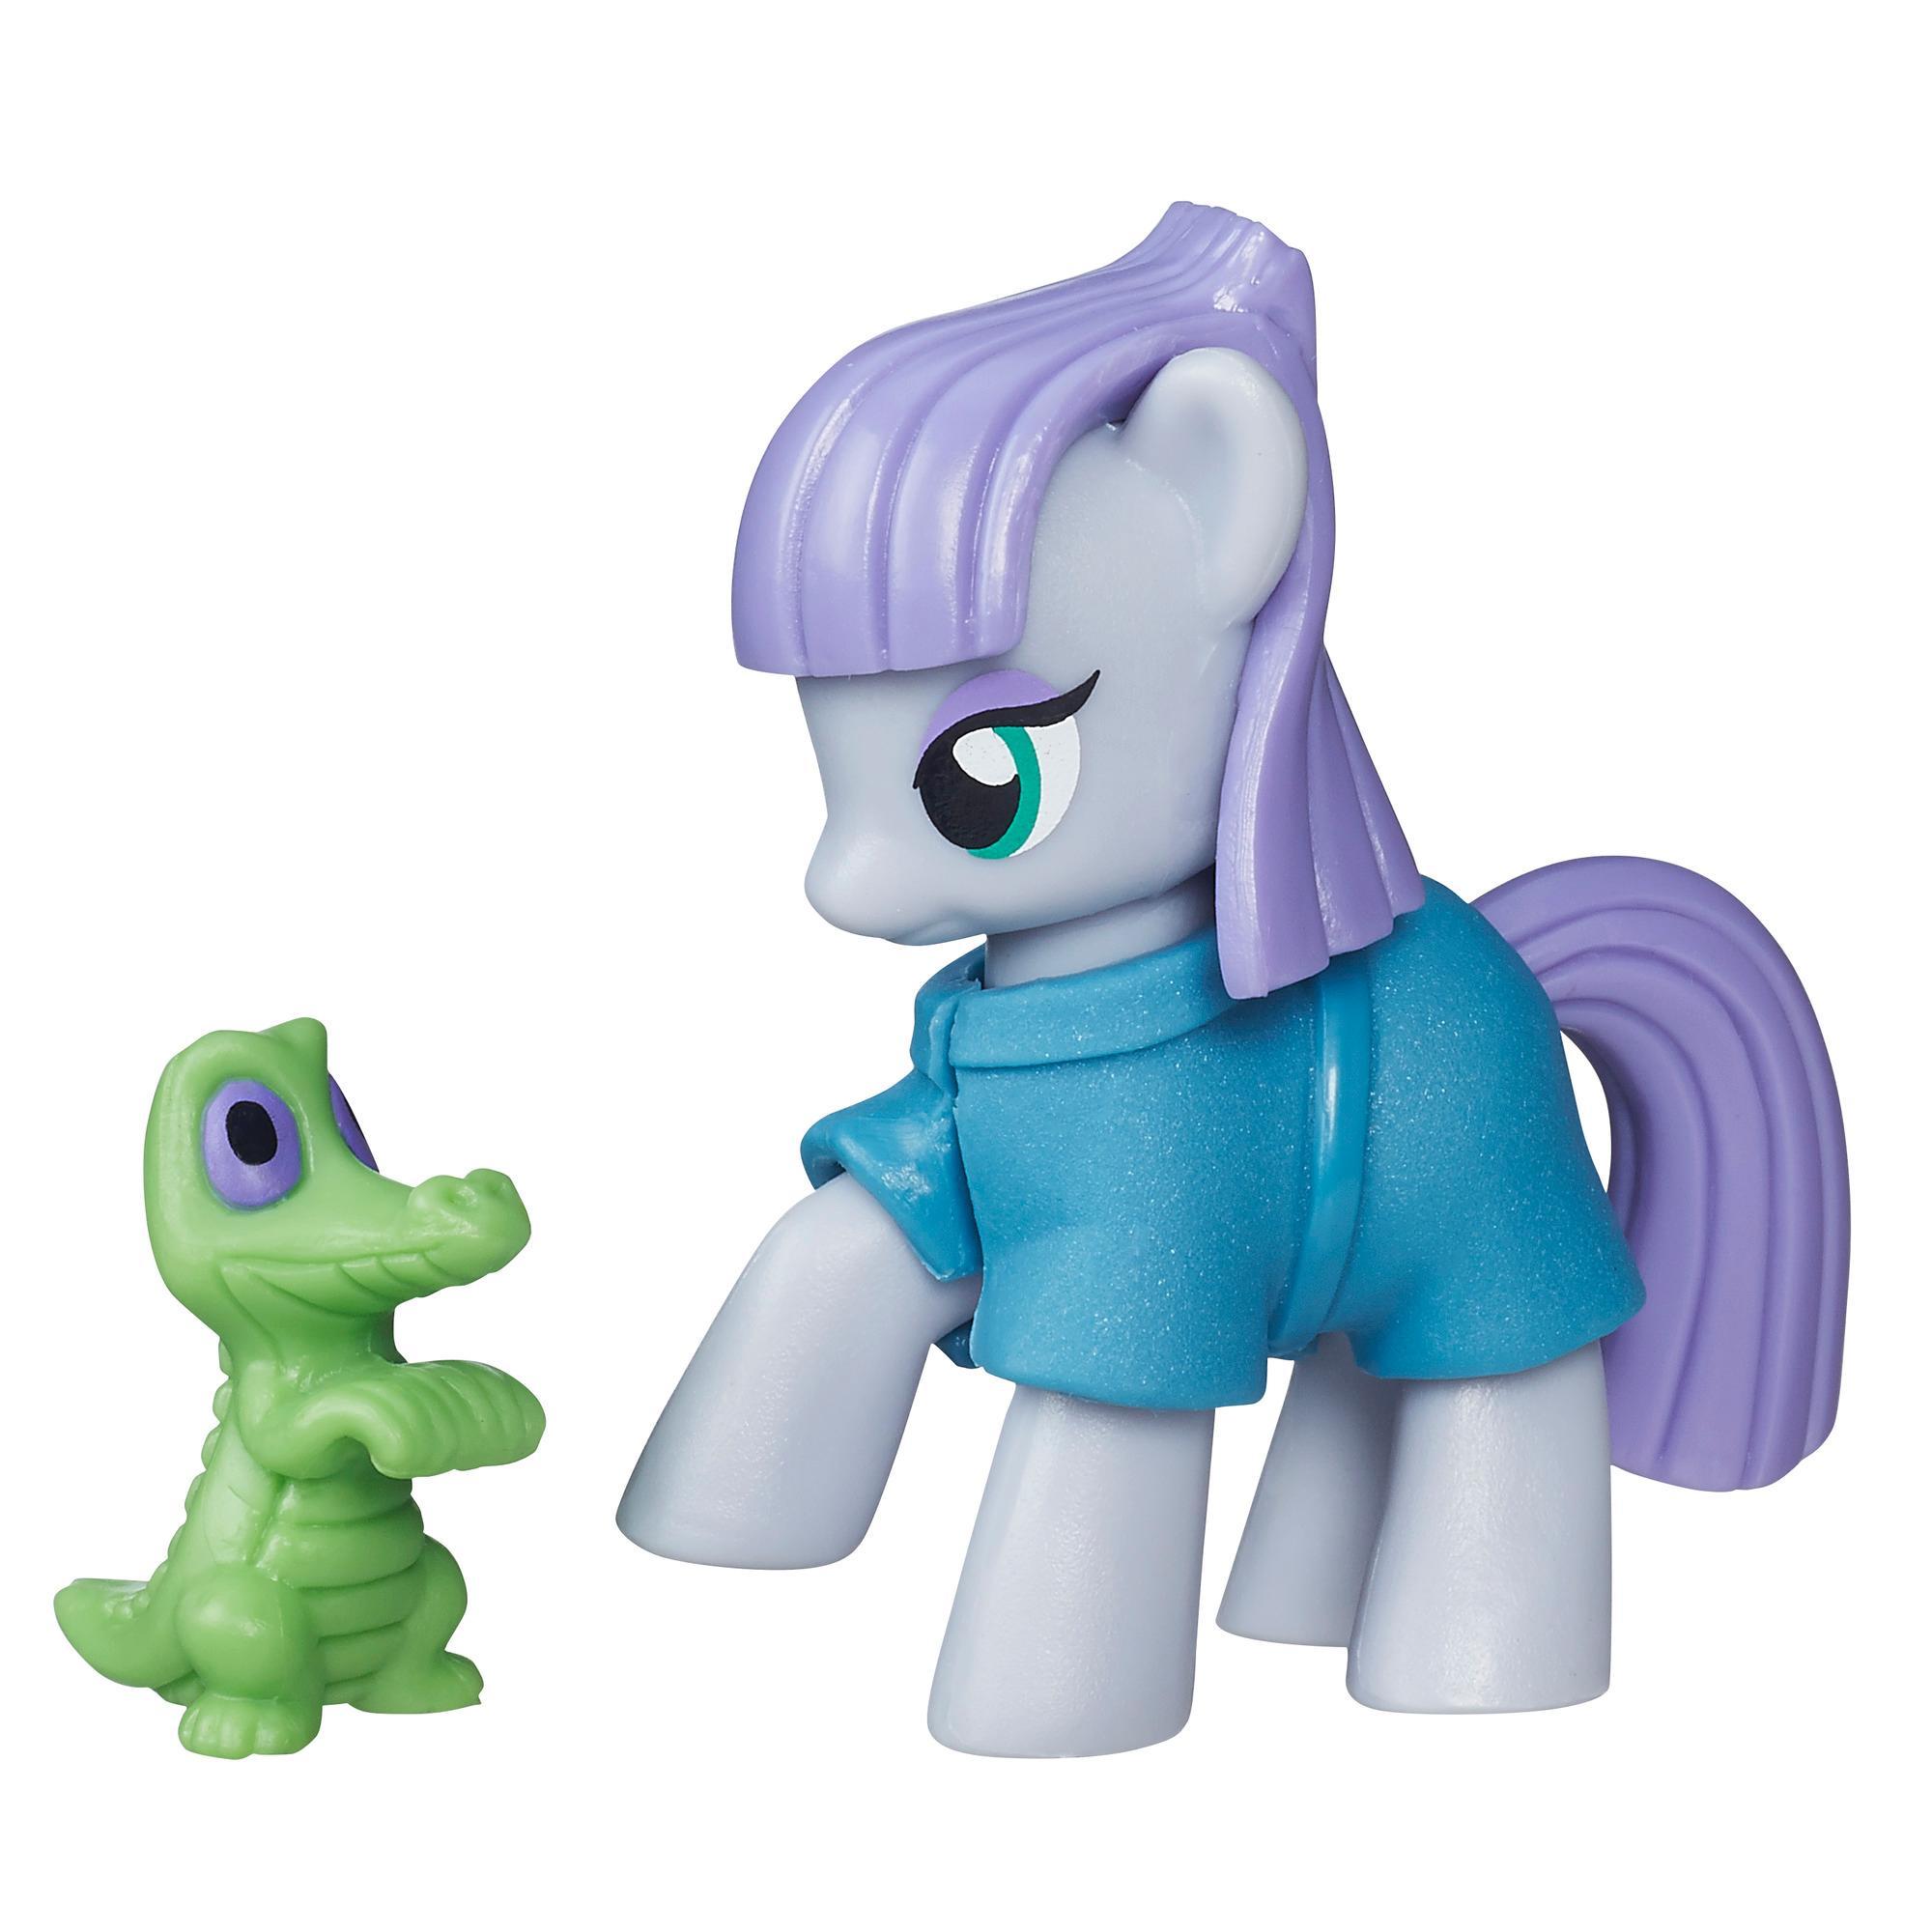 My Little Pony Friendship is Magic singoli - Maud Rock Pie